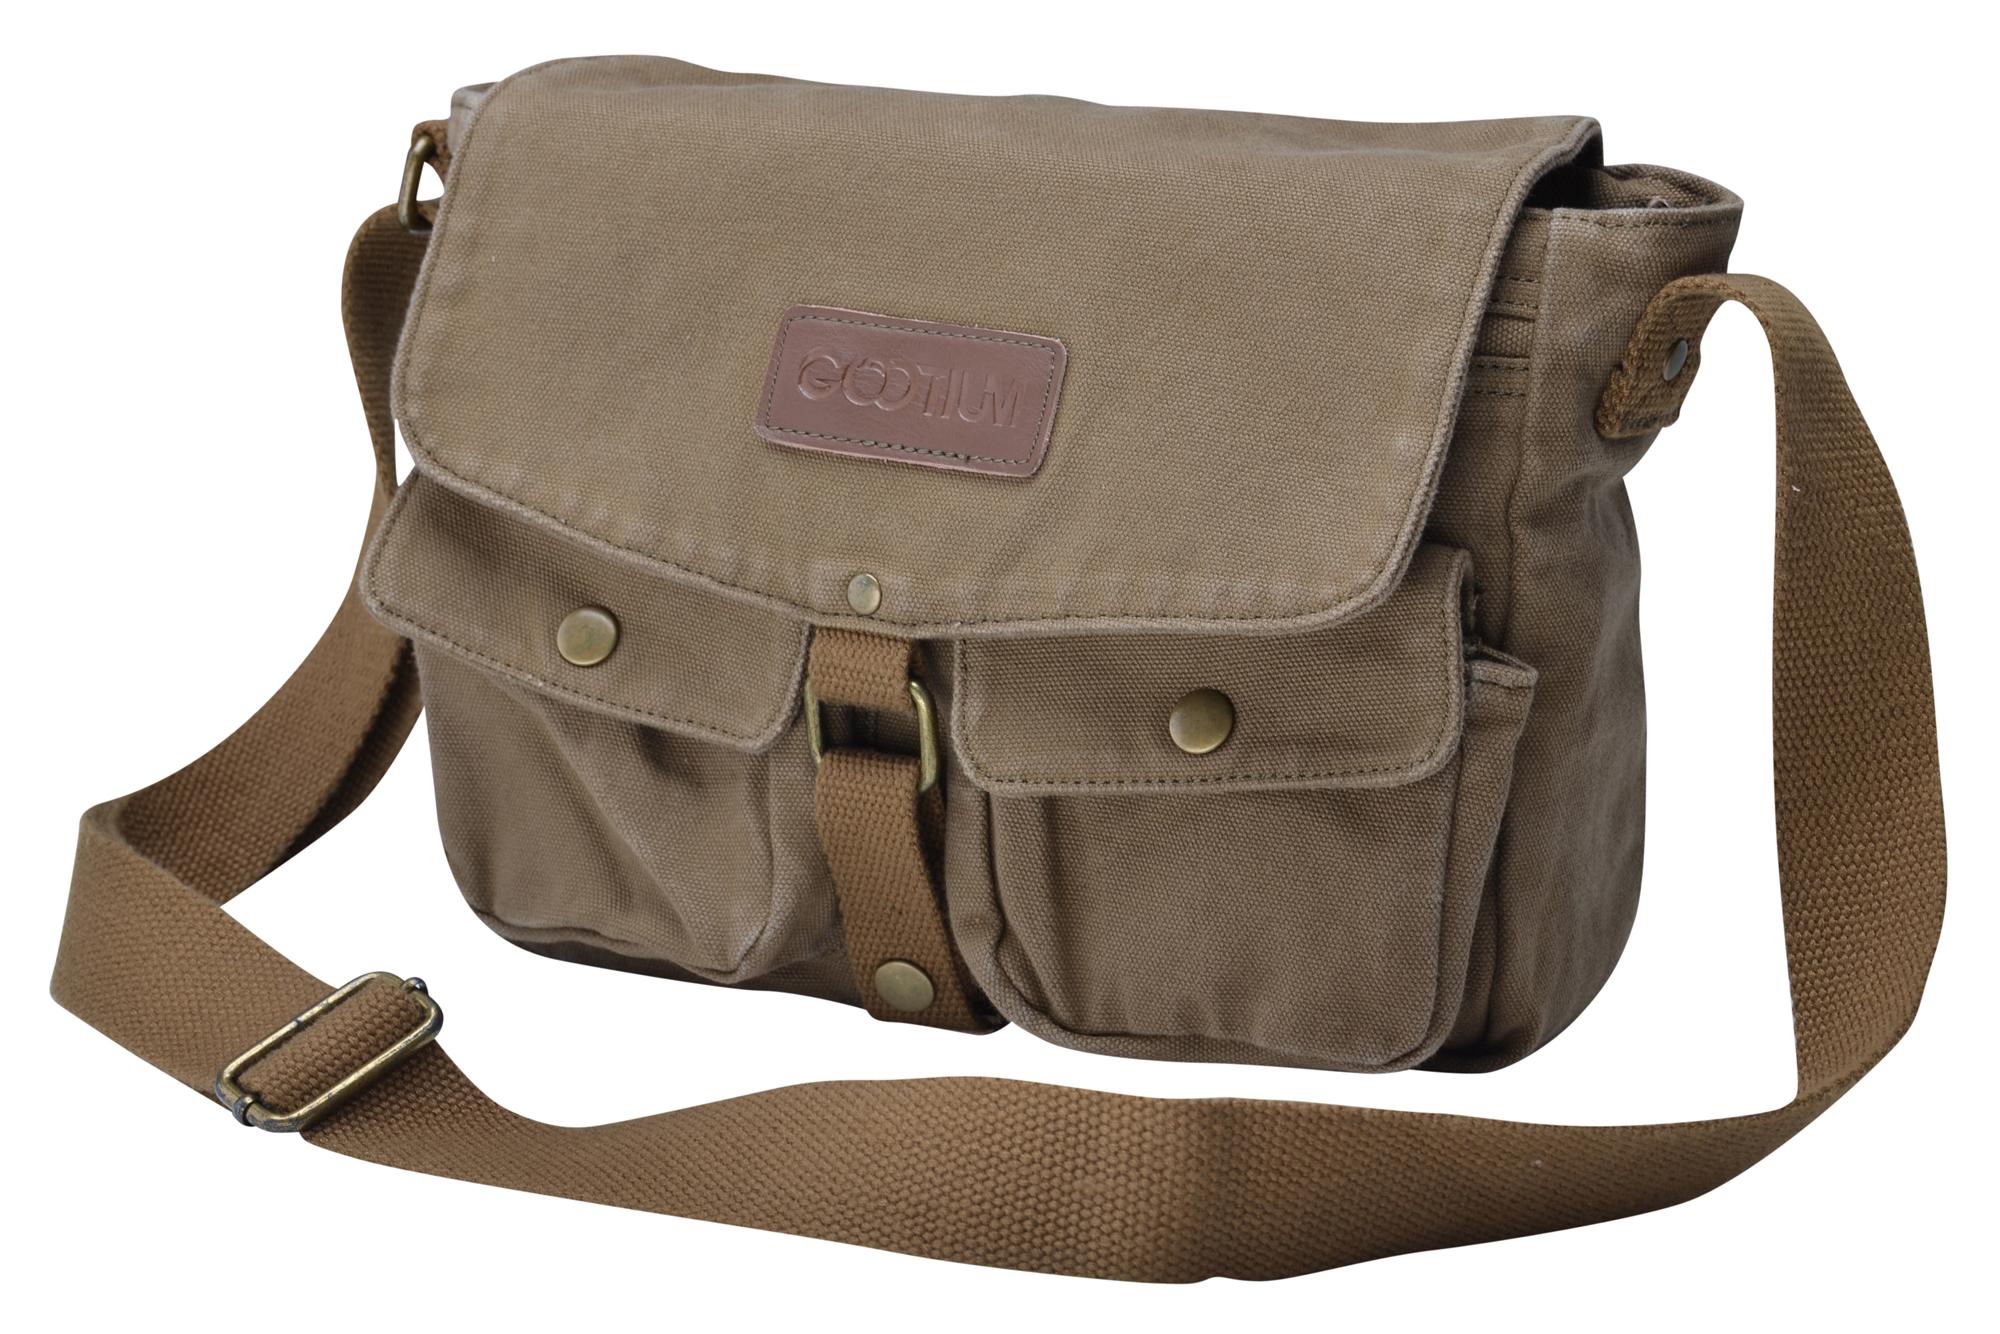 gootium canvas genuine leather classic messenger bag. Black Bedroom Furniture Sets. Home Design Ideas